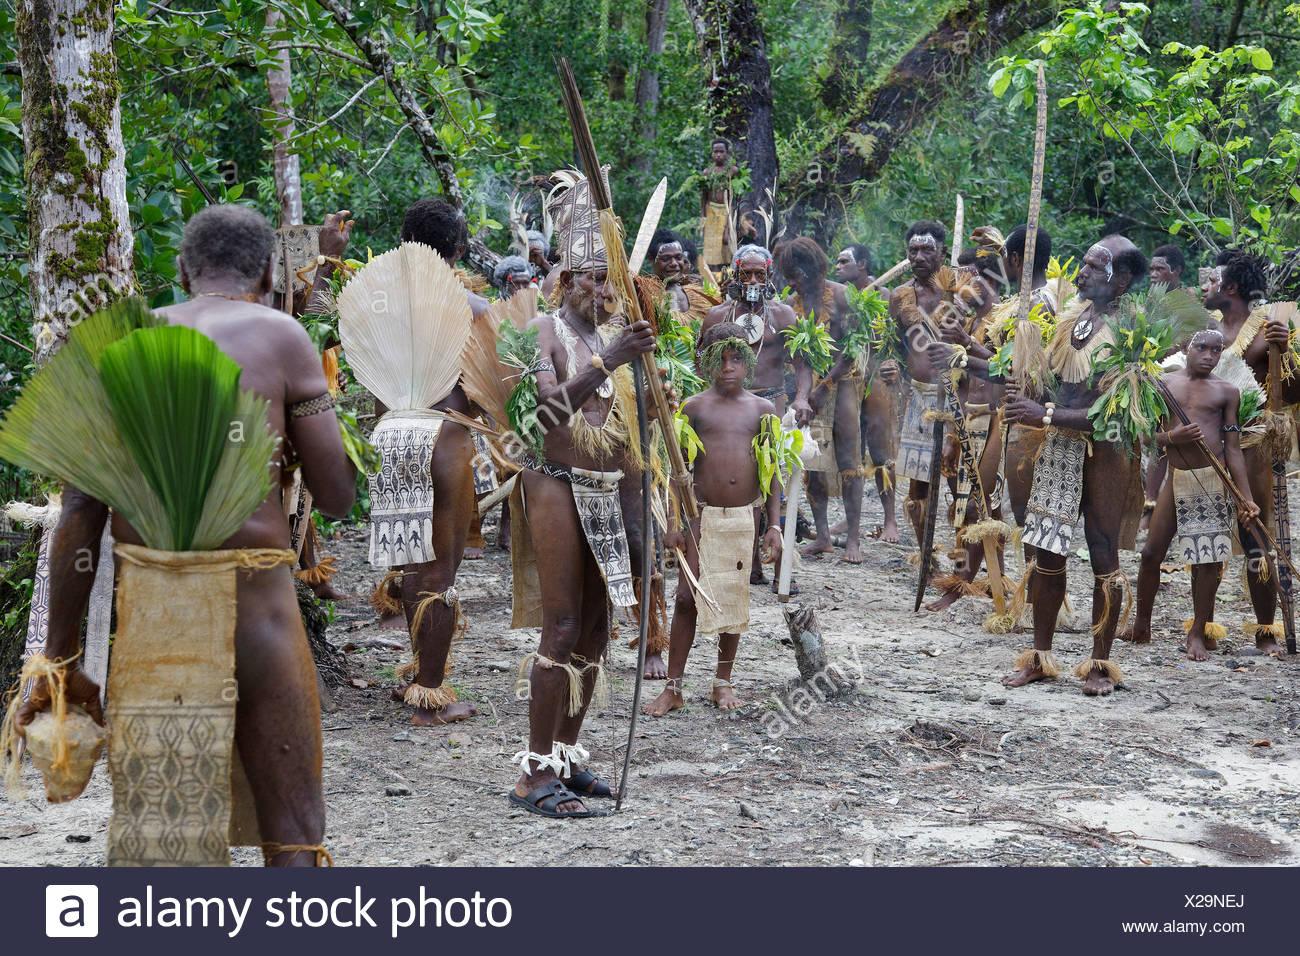 Primitive people, Santa Cruz Island, Solomon Islands, Melanesia, Oceania - Stock Image